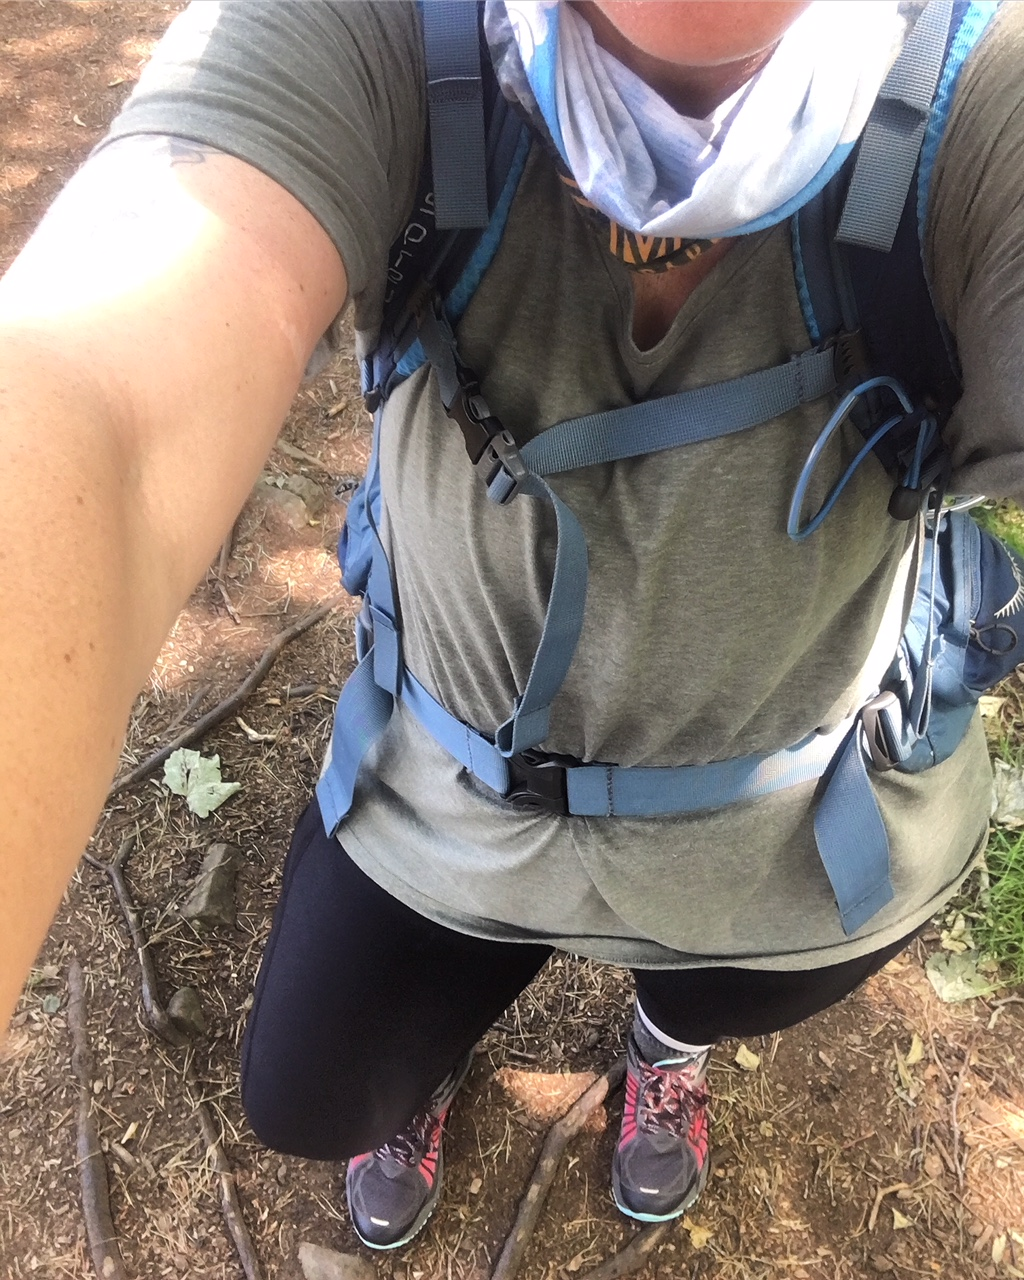 My hiking clothes. Fjallraven trekking tights, Columbia omni-freeze shirts, Brooks Caldera trail runners, Darn Tough hiking socks, Fox River sock liners and the Osprey Kyte 46.